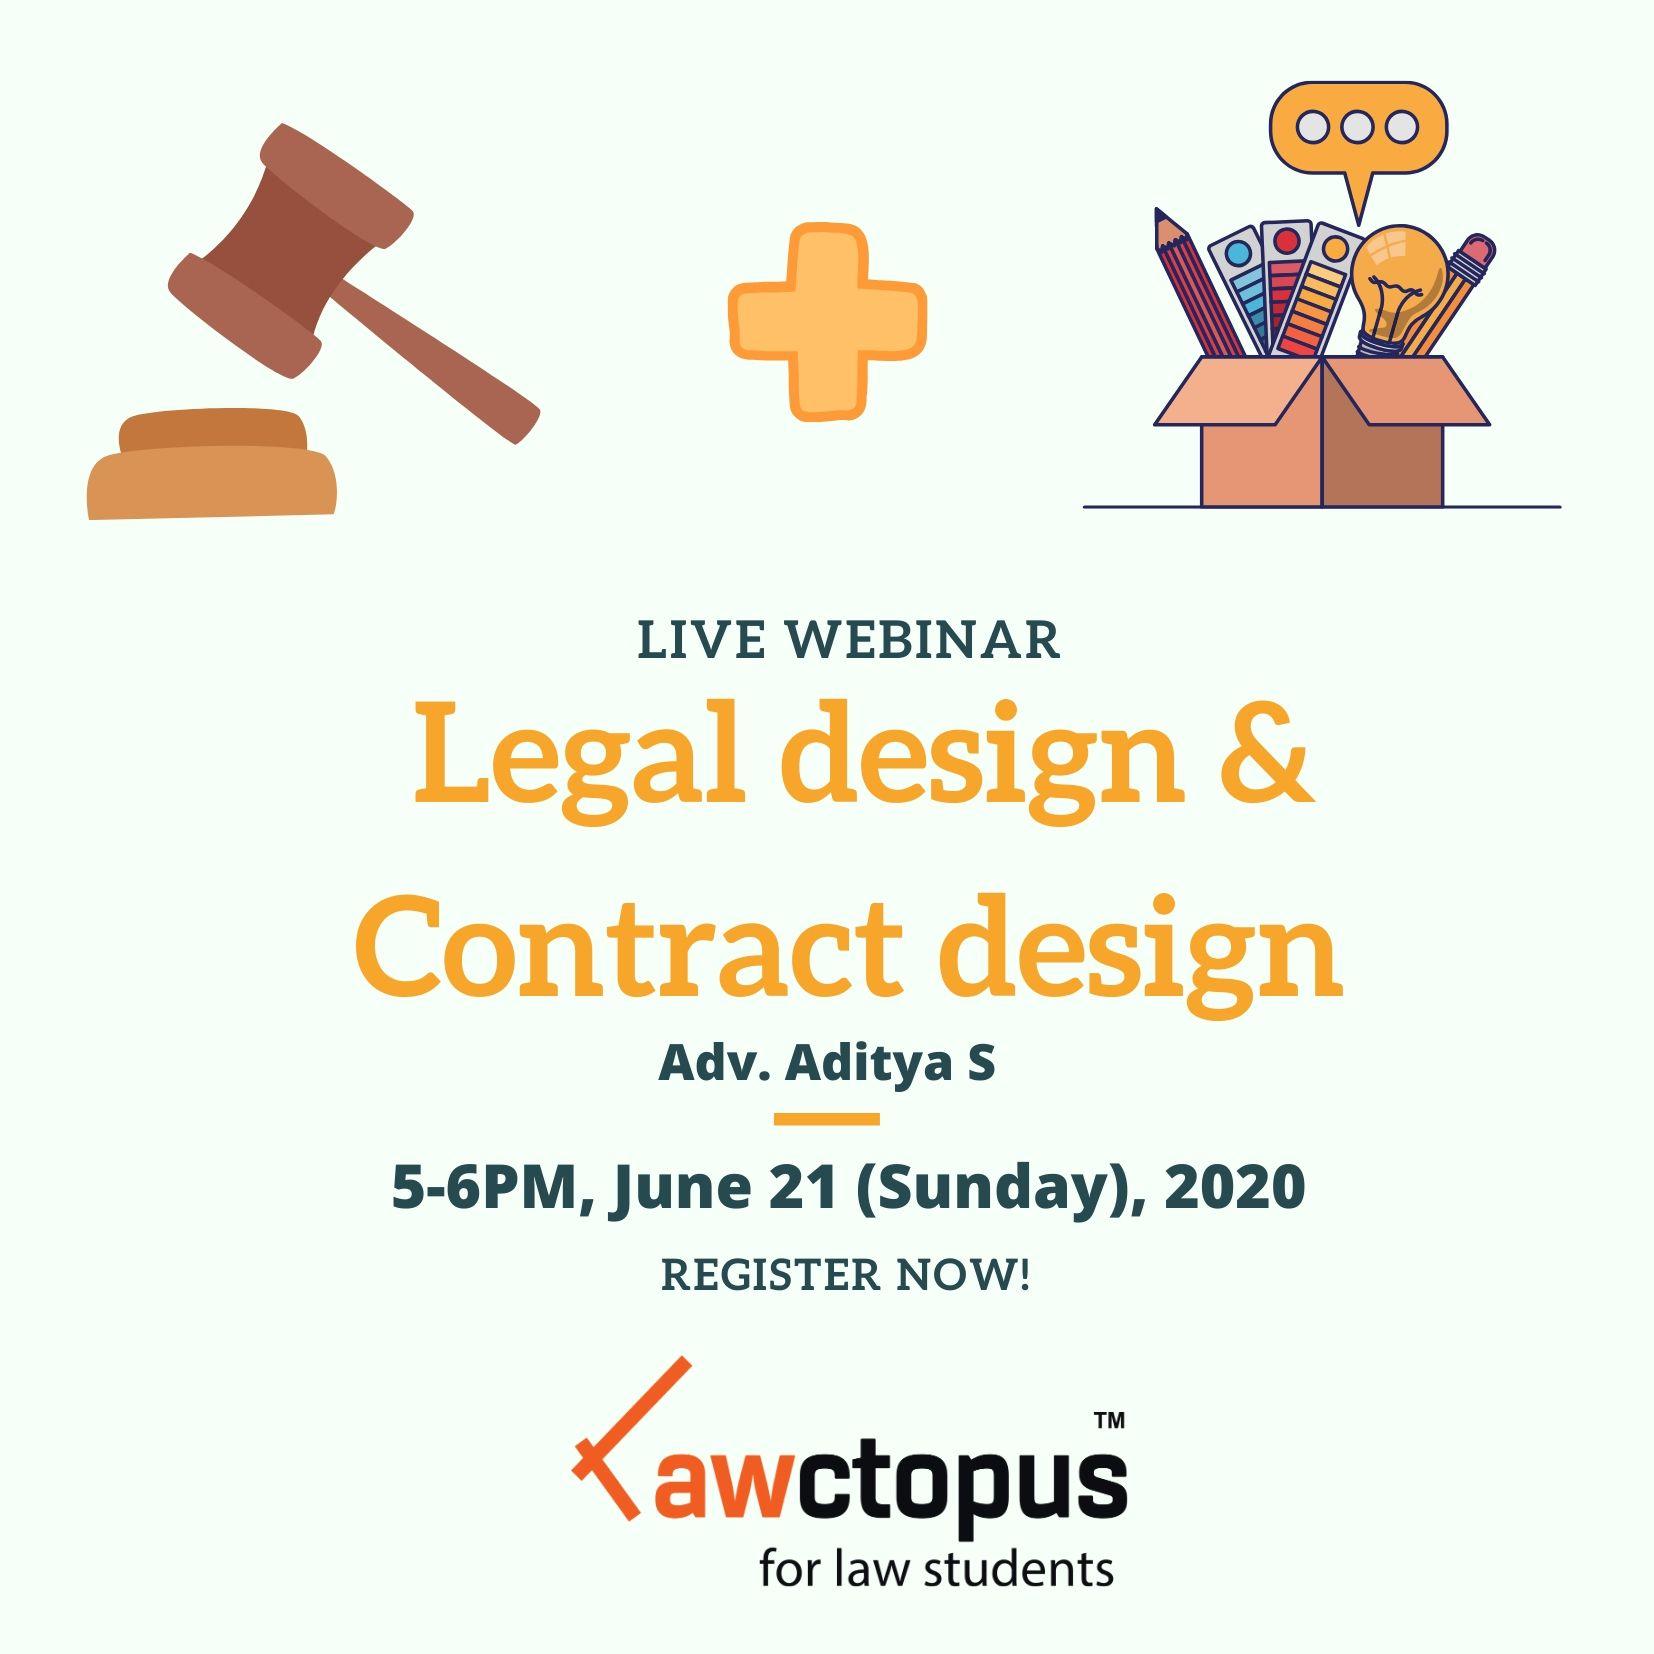 lawctopus webinar on legal design